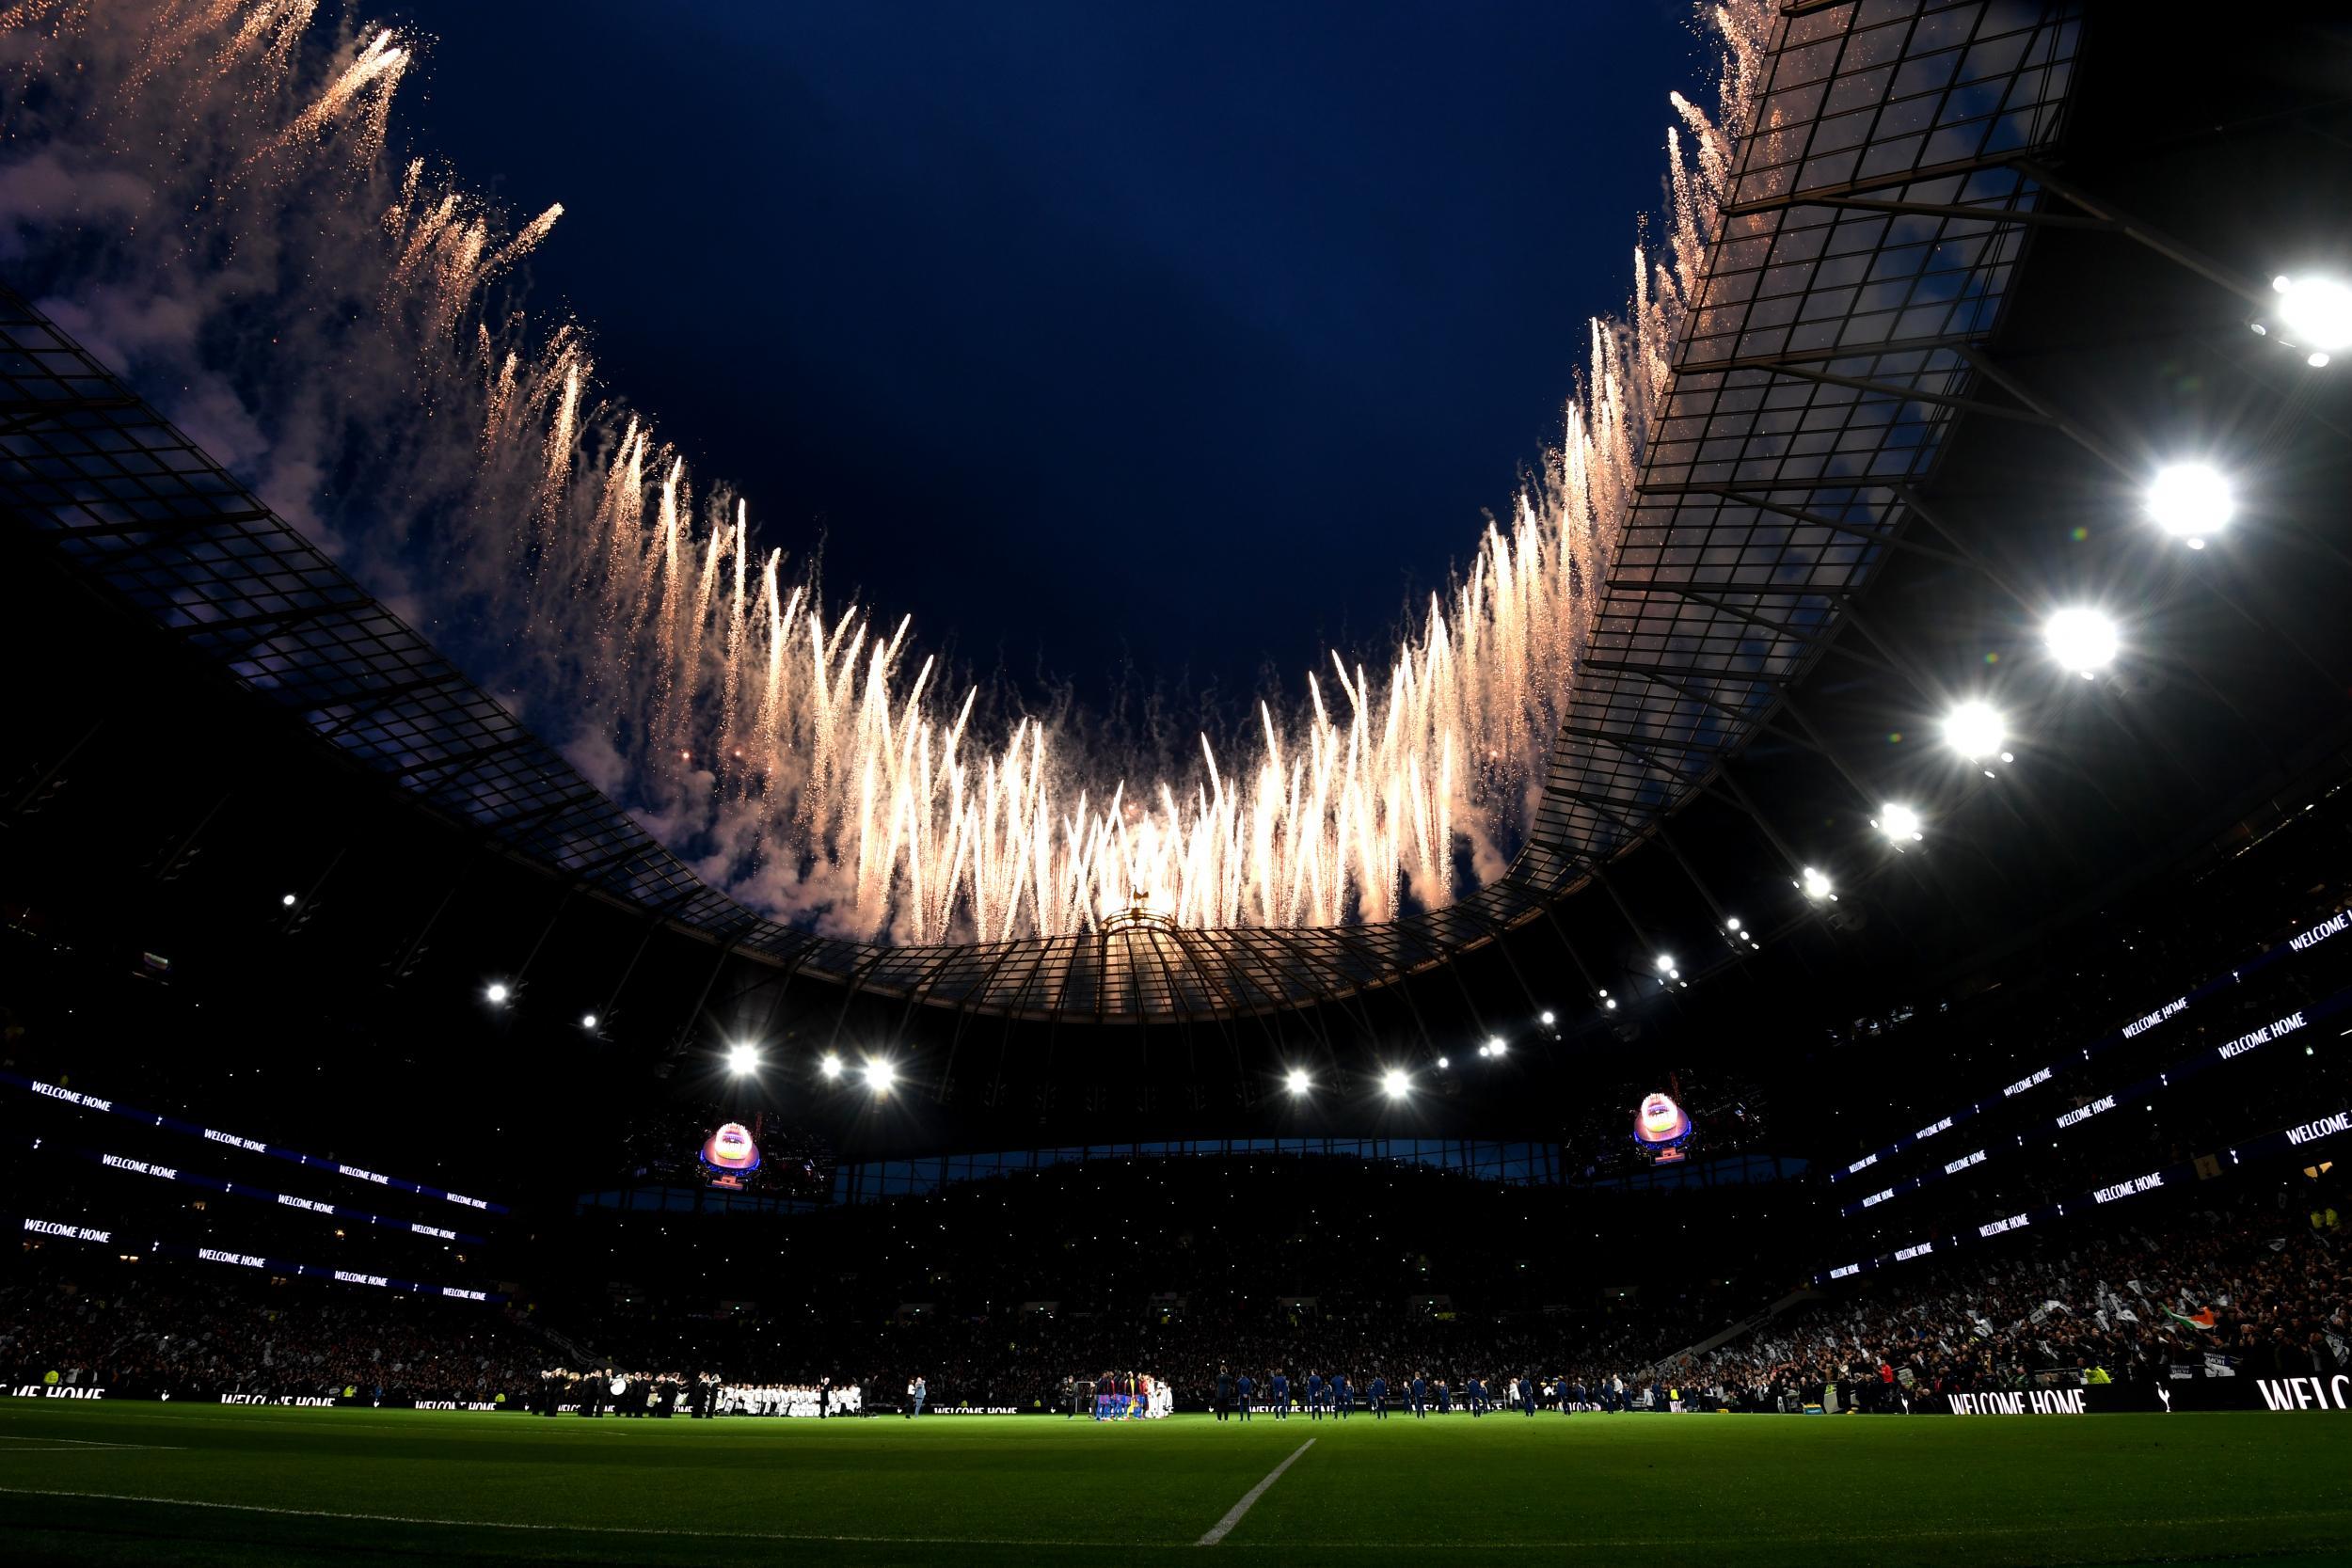 Tottenham Hotspur Stadium Desktop Wallpapers - Wallpaper Cave